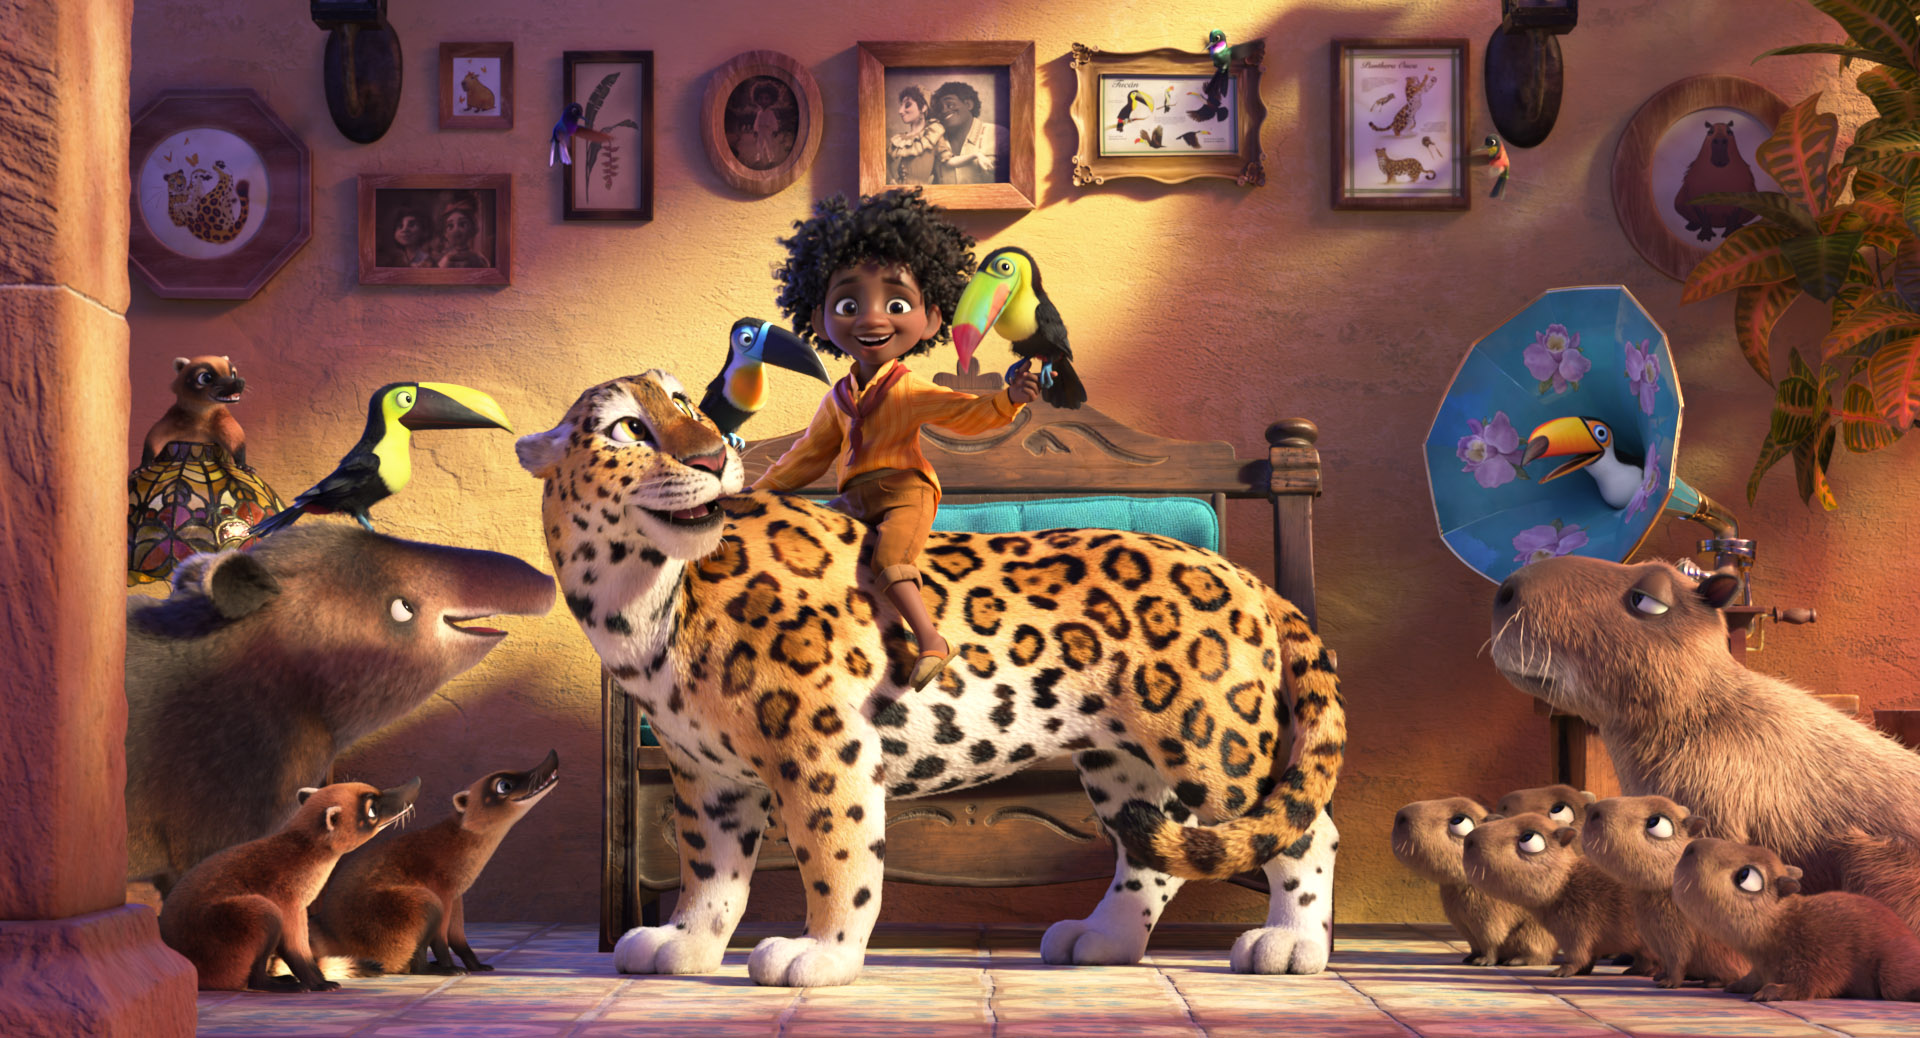 Encanto - La Fantastique Famille Madrigal [Walt Disney - 2021] - Page 3 E5w_fppWYAETpax?format=jpg&name=large